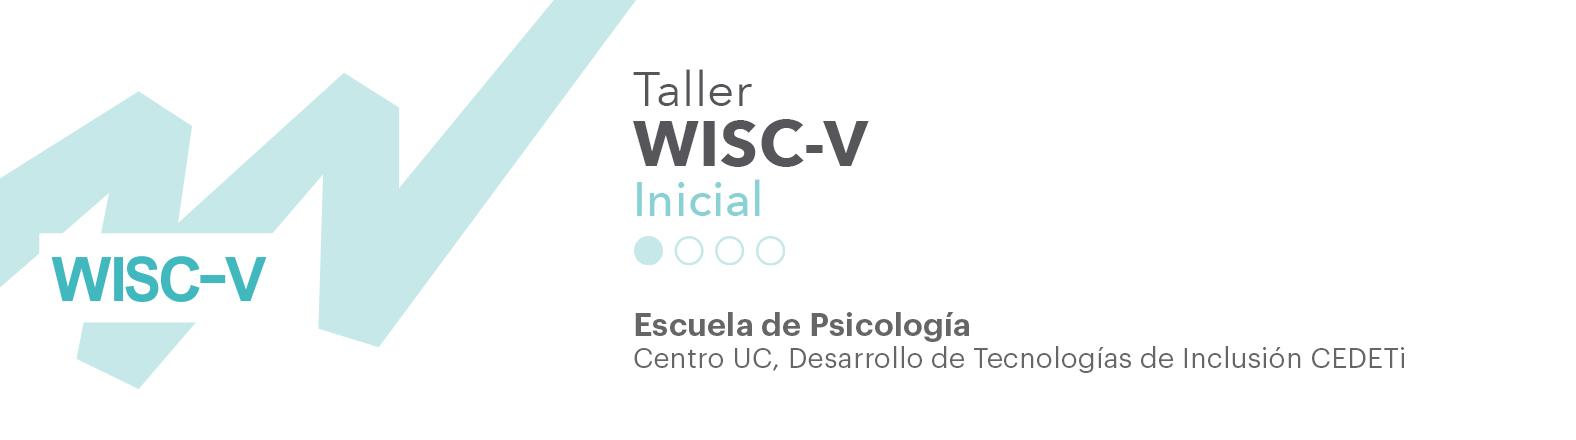 imagen de taller WISC-V nivel inicial